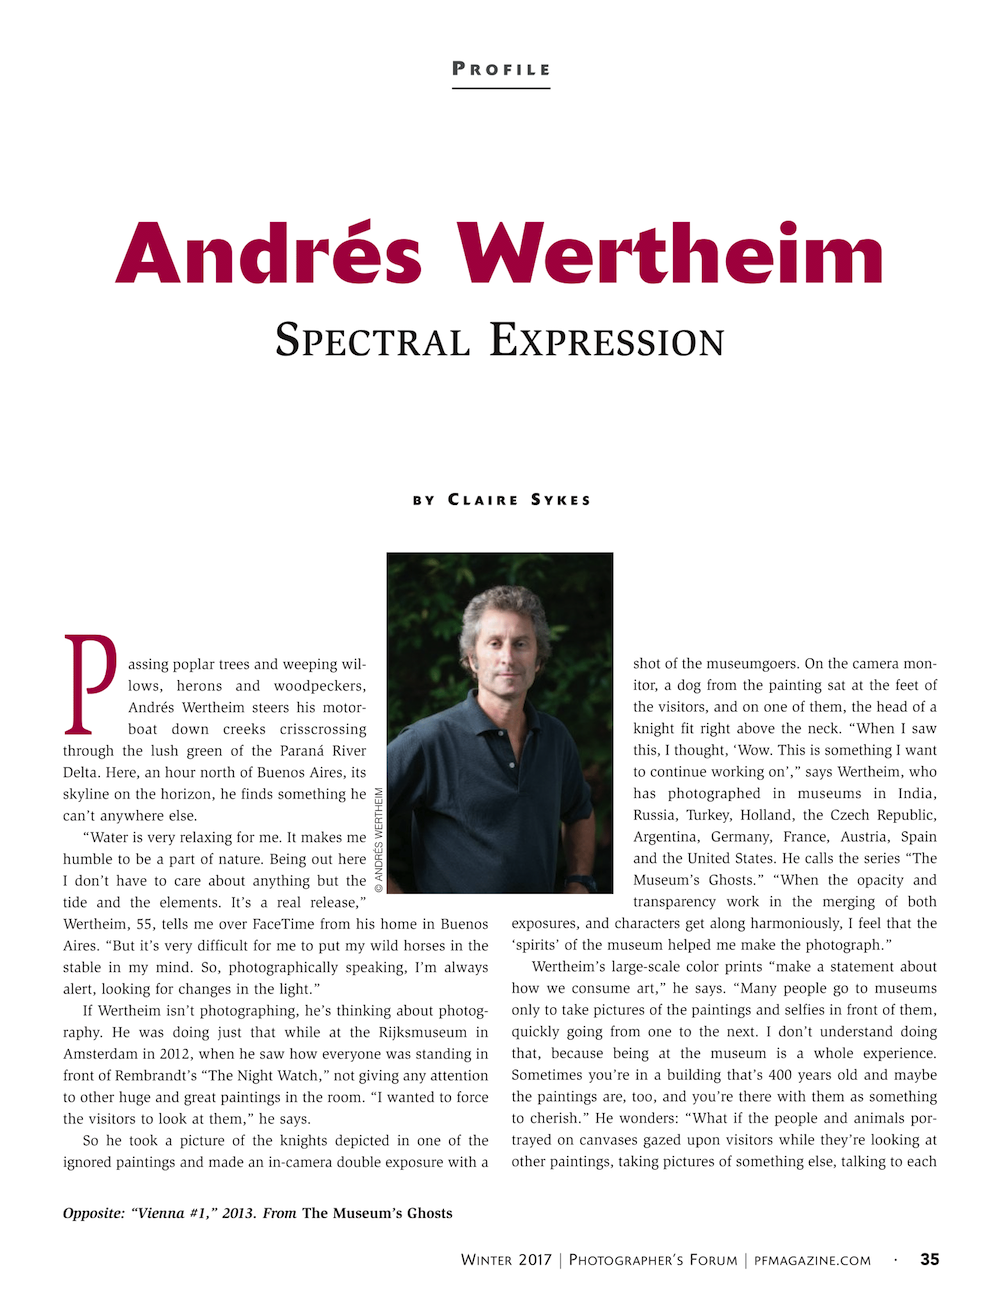 PFNOV17 Wertheim cropped PDF-02.png